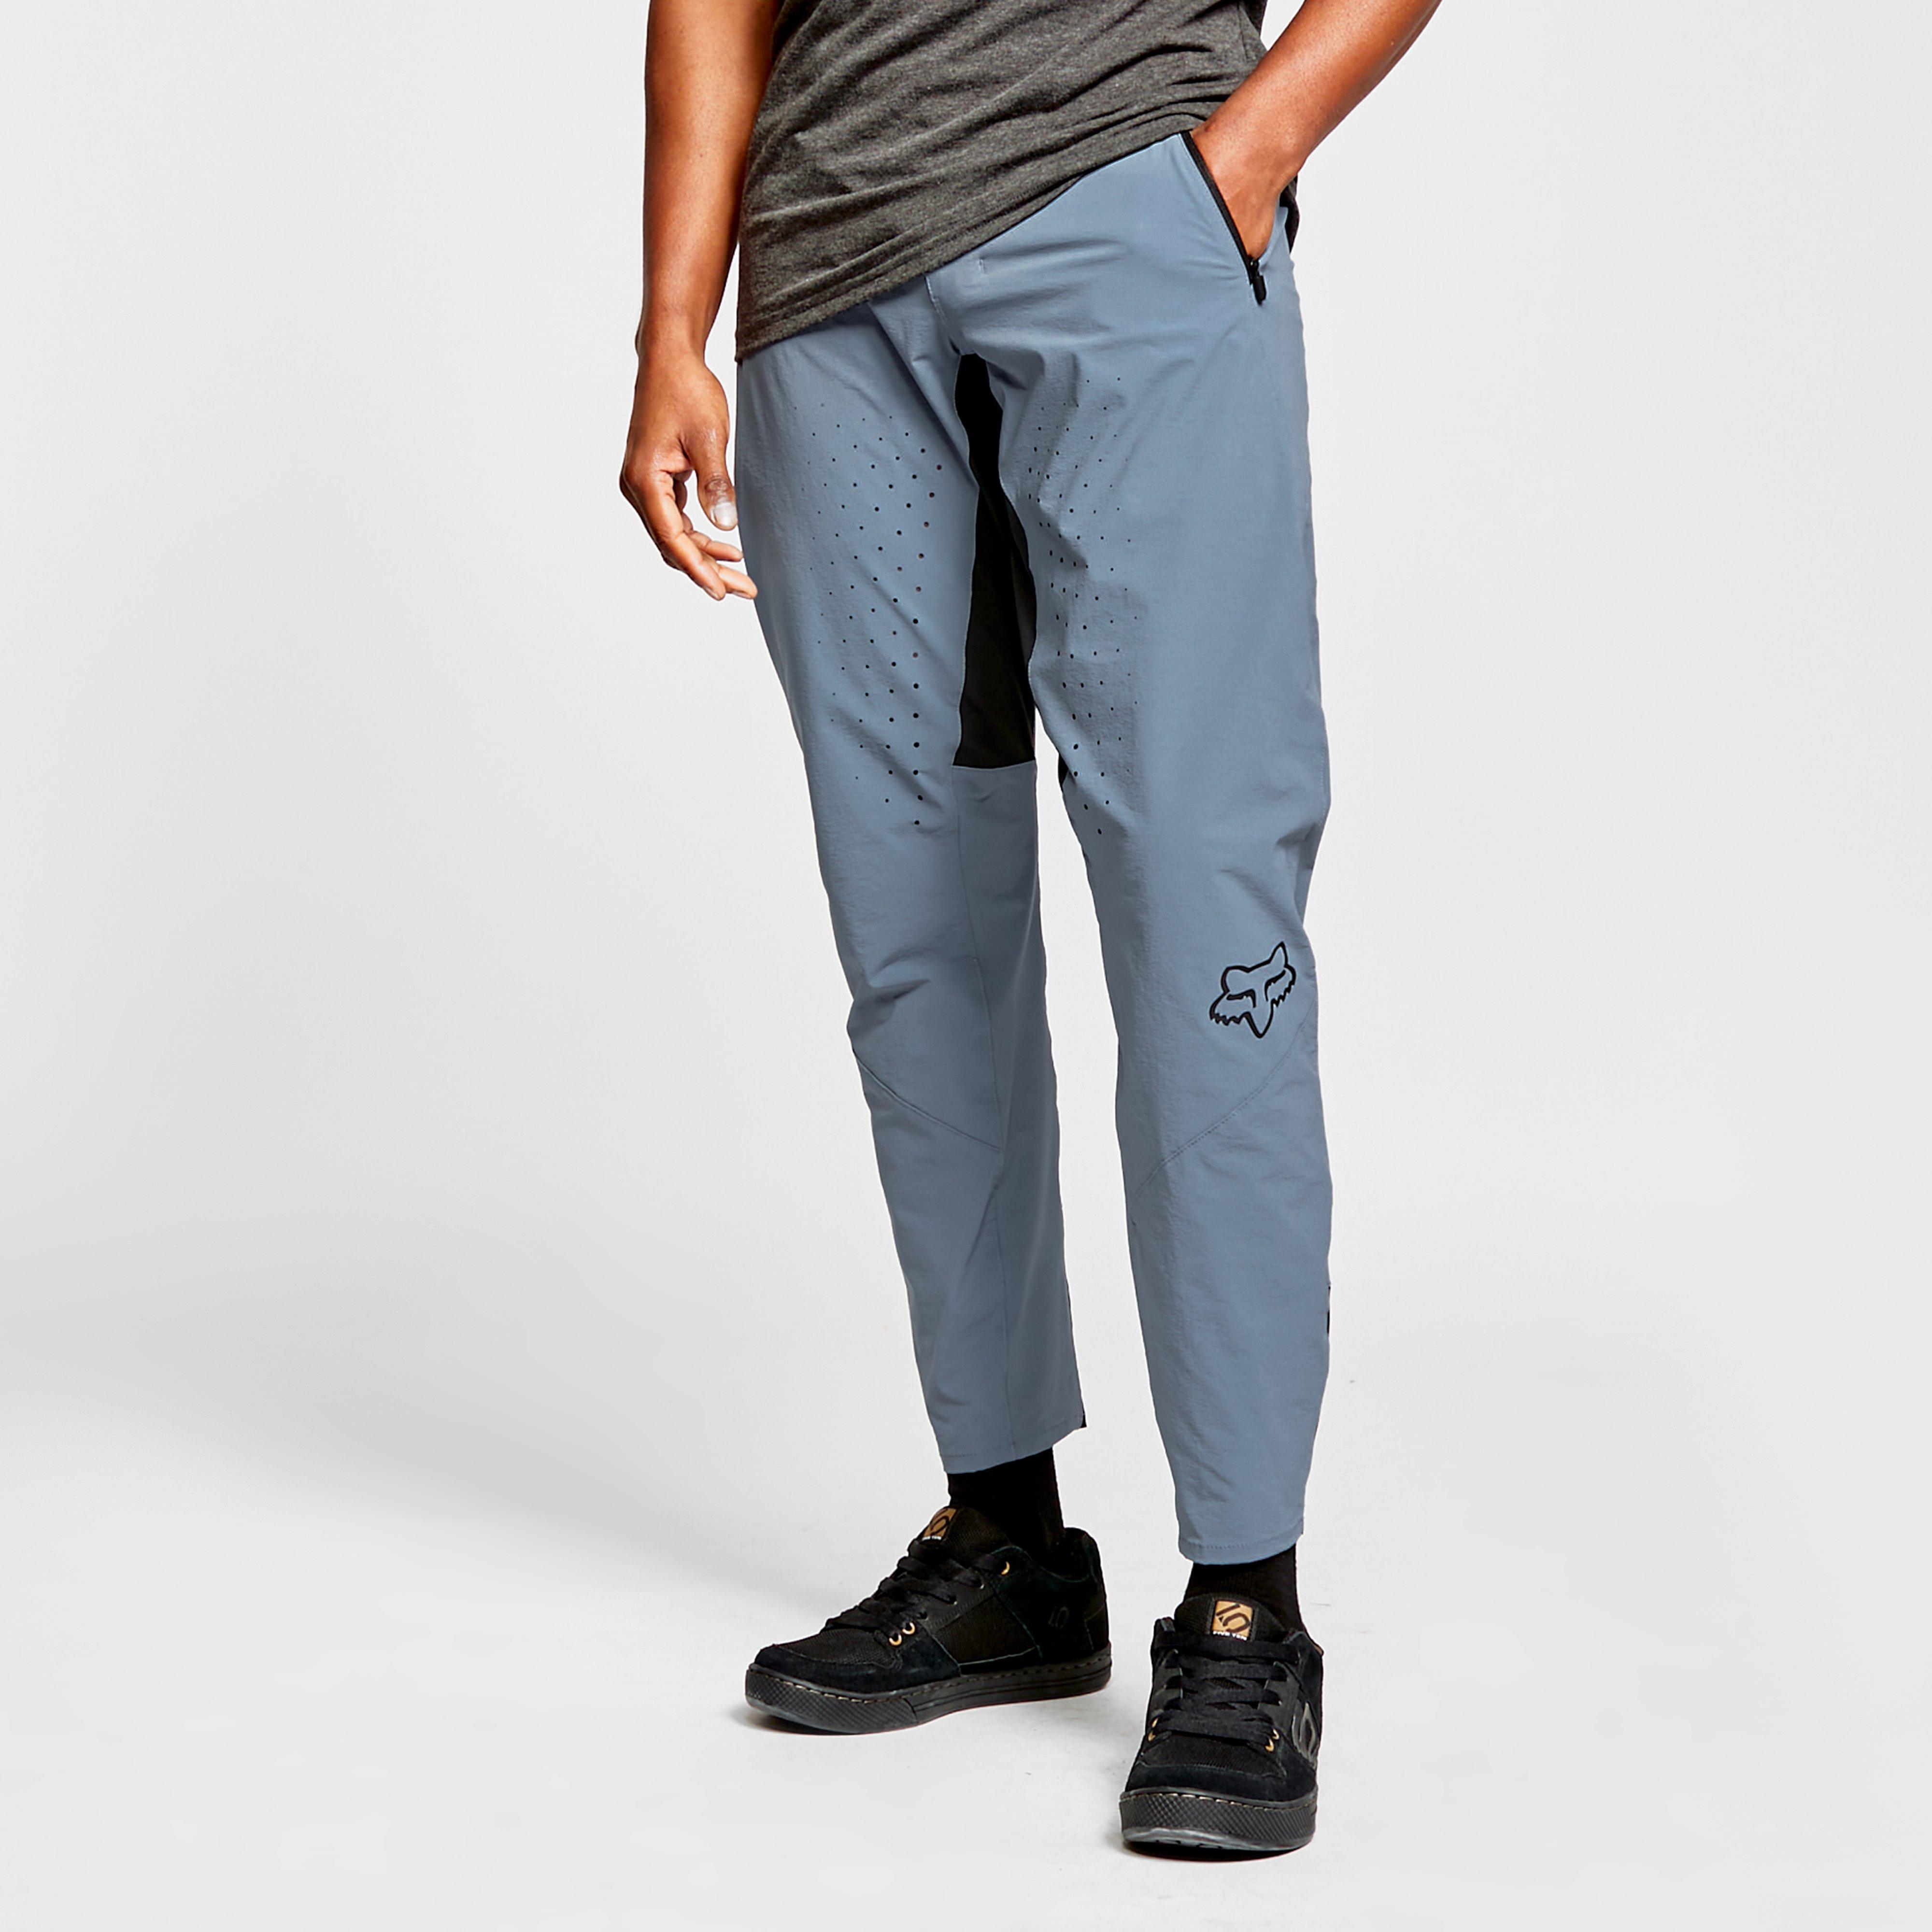 Fox Men's Flexair Pants - Blue/Blue, Blue